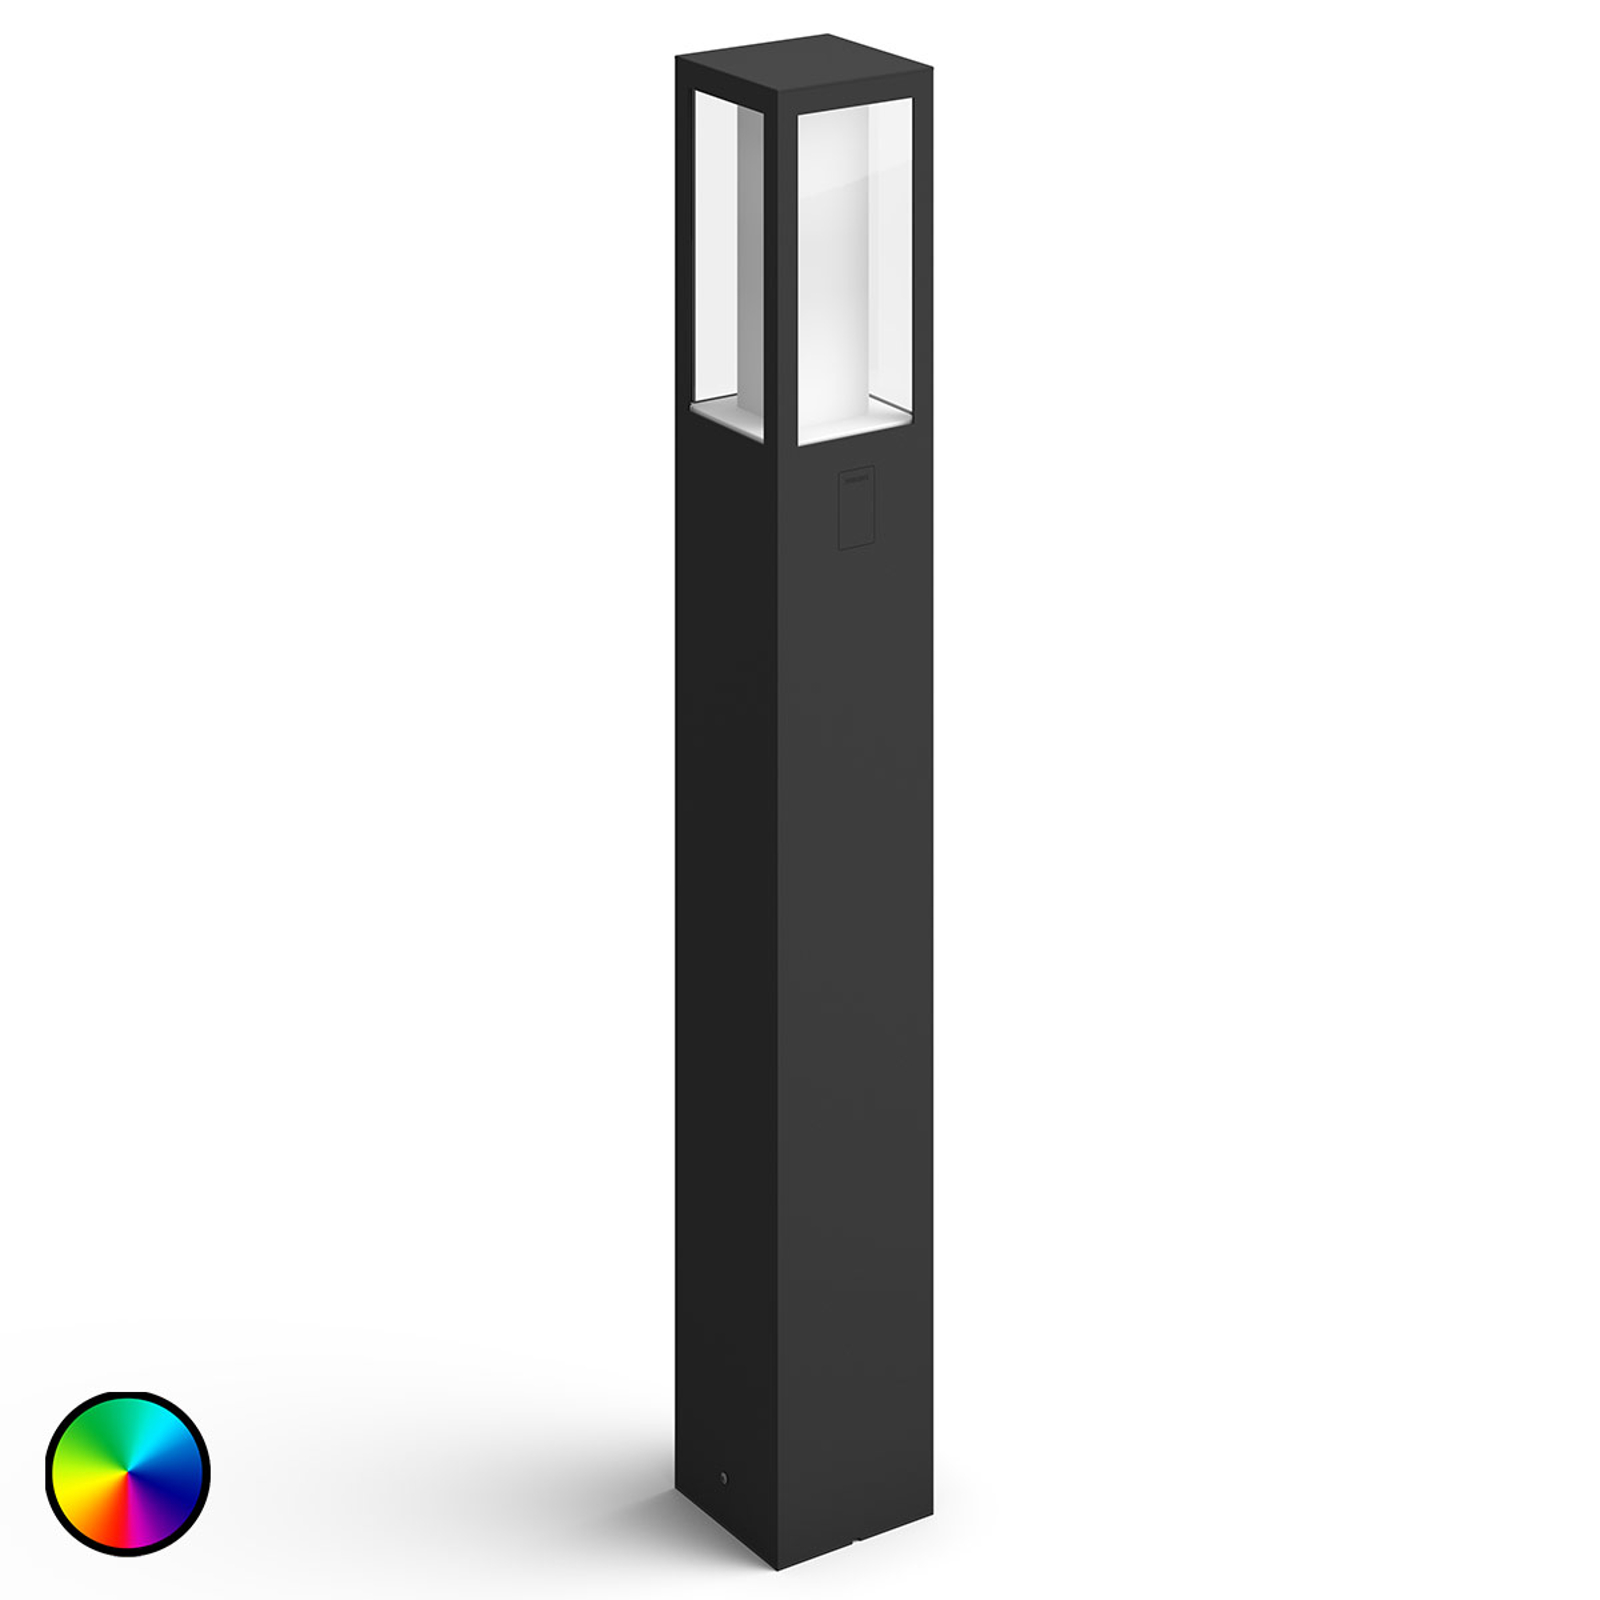 Philips Hue White+Color Impress LED-veilampe